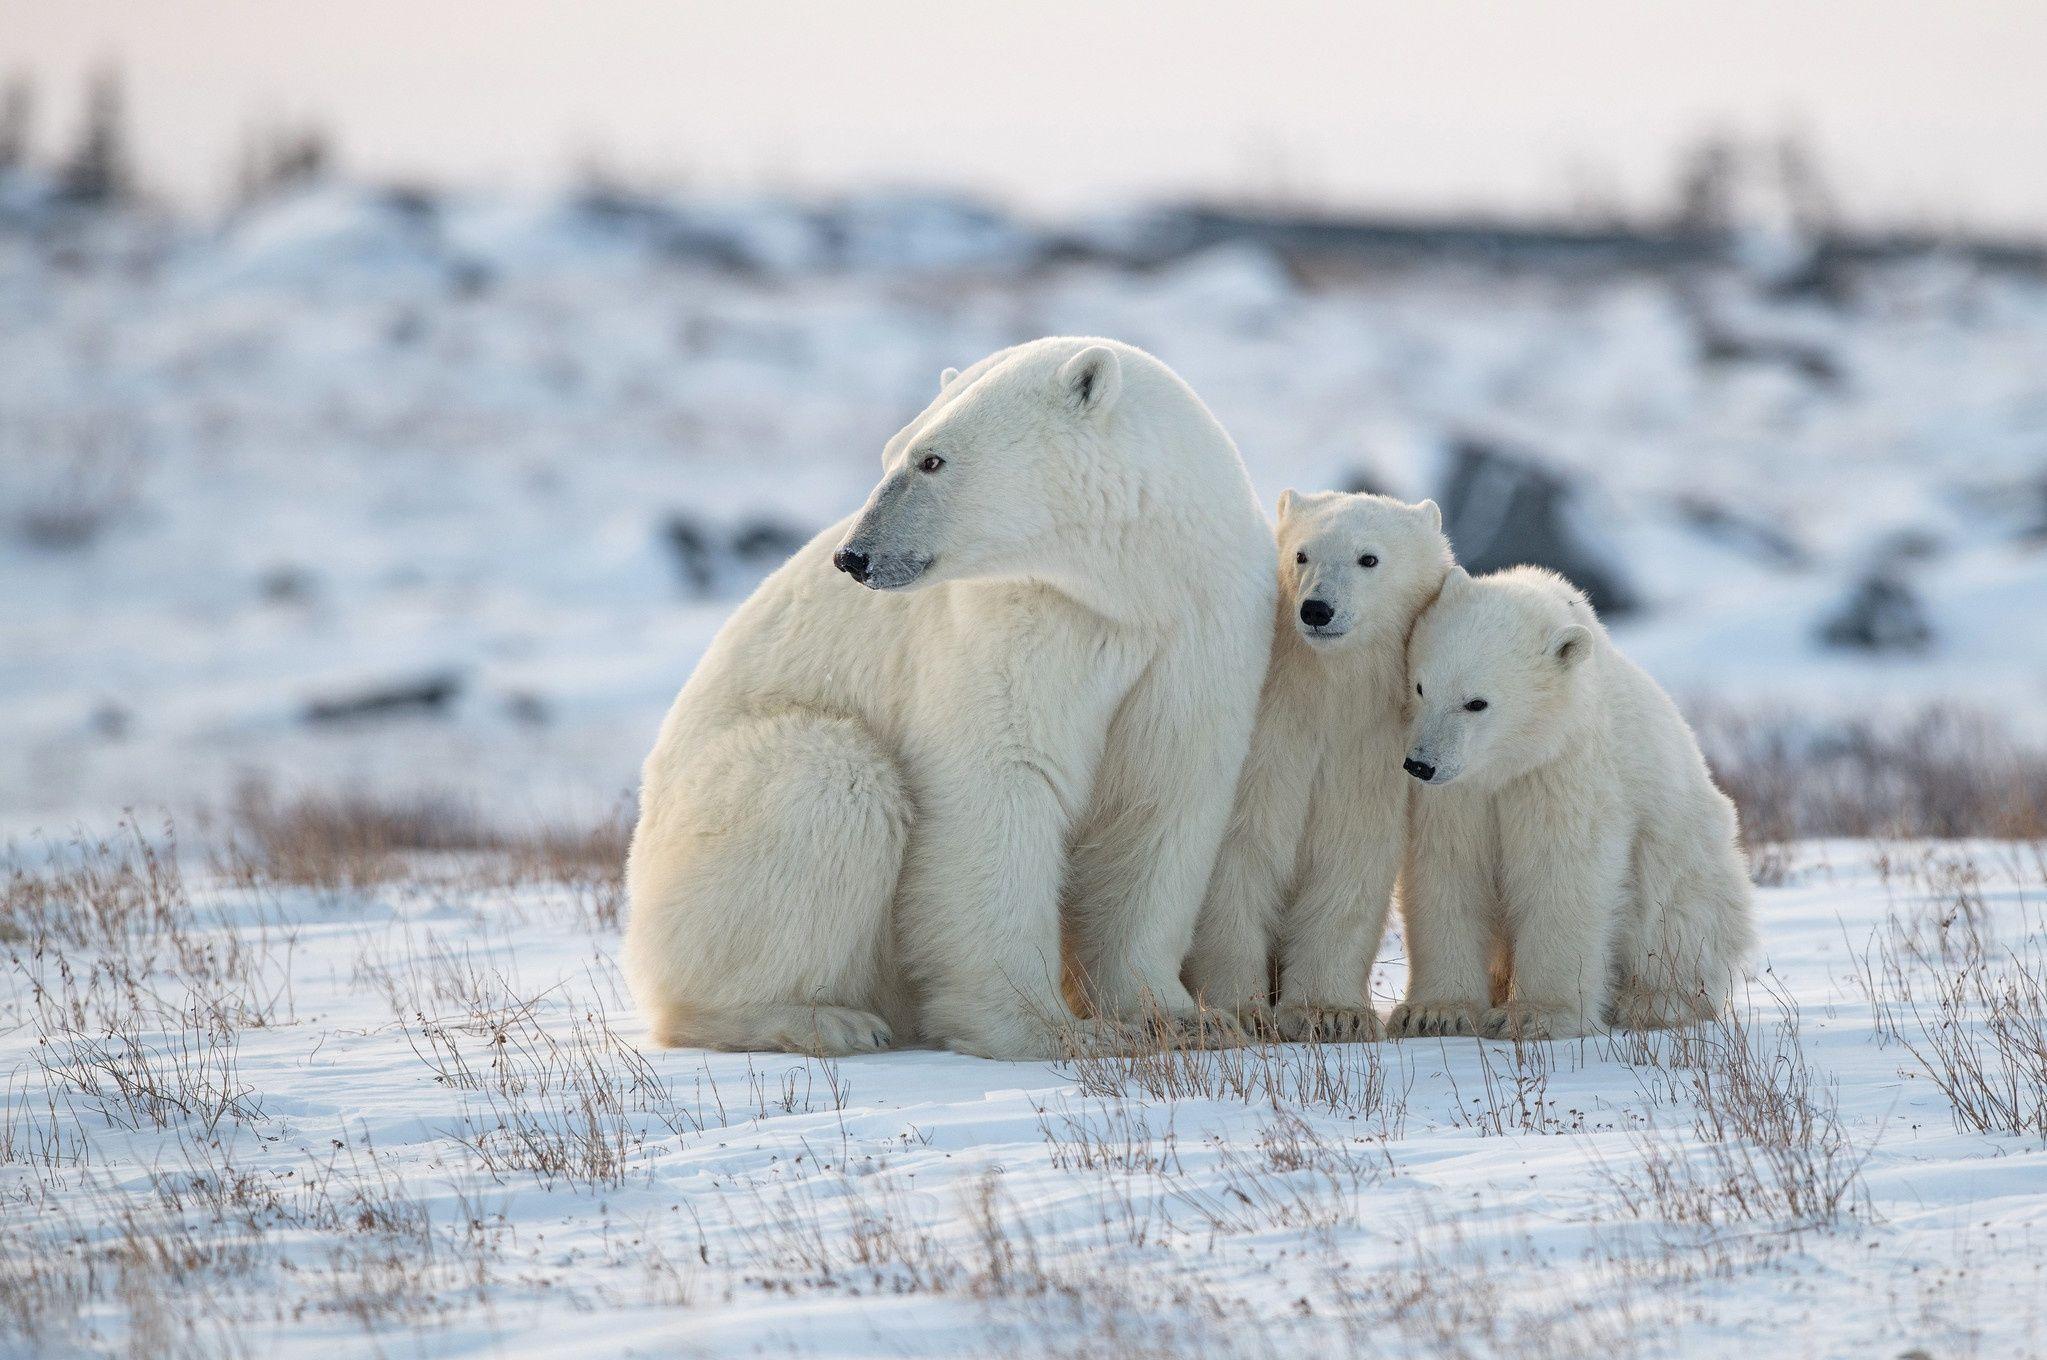 Animal Polar Bear Bears Wildlife Predator Snow Hd Wallpaper Background Image Wallpaper Cart Polar Bear Animals Bear Wallpaper